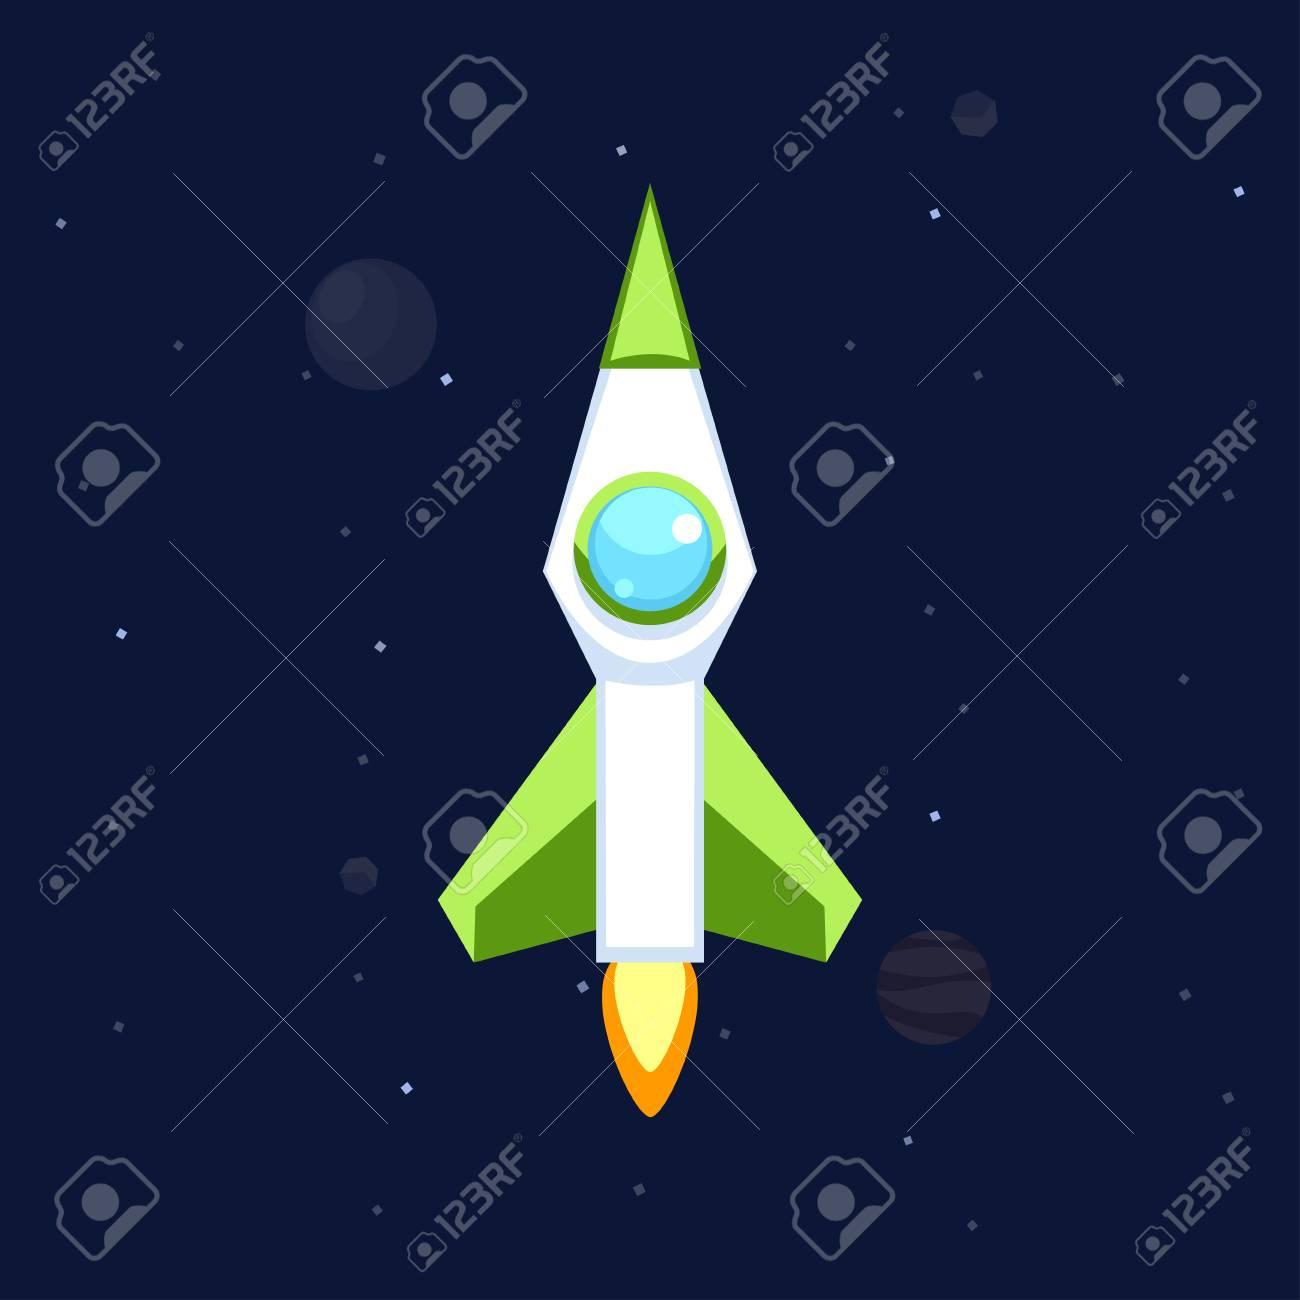 Rocket icons - 69017556